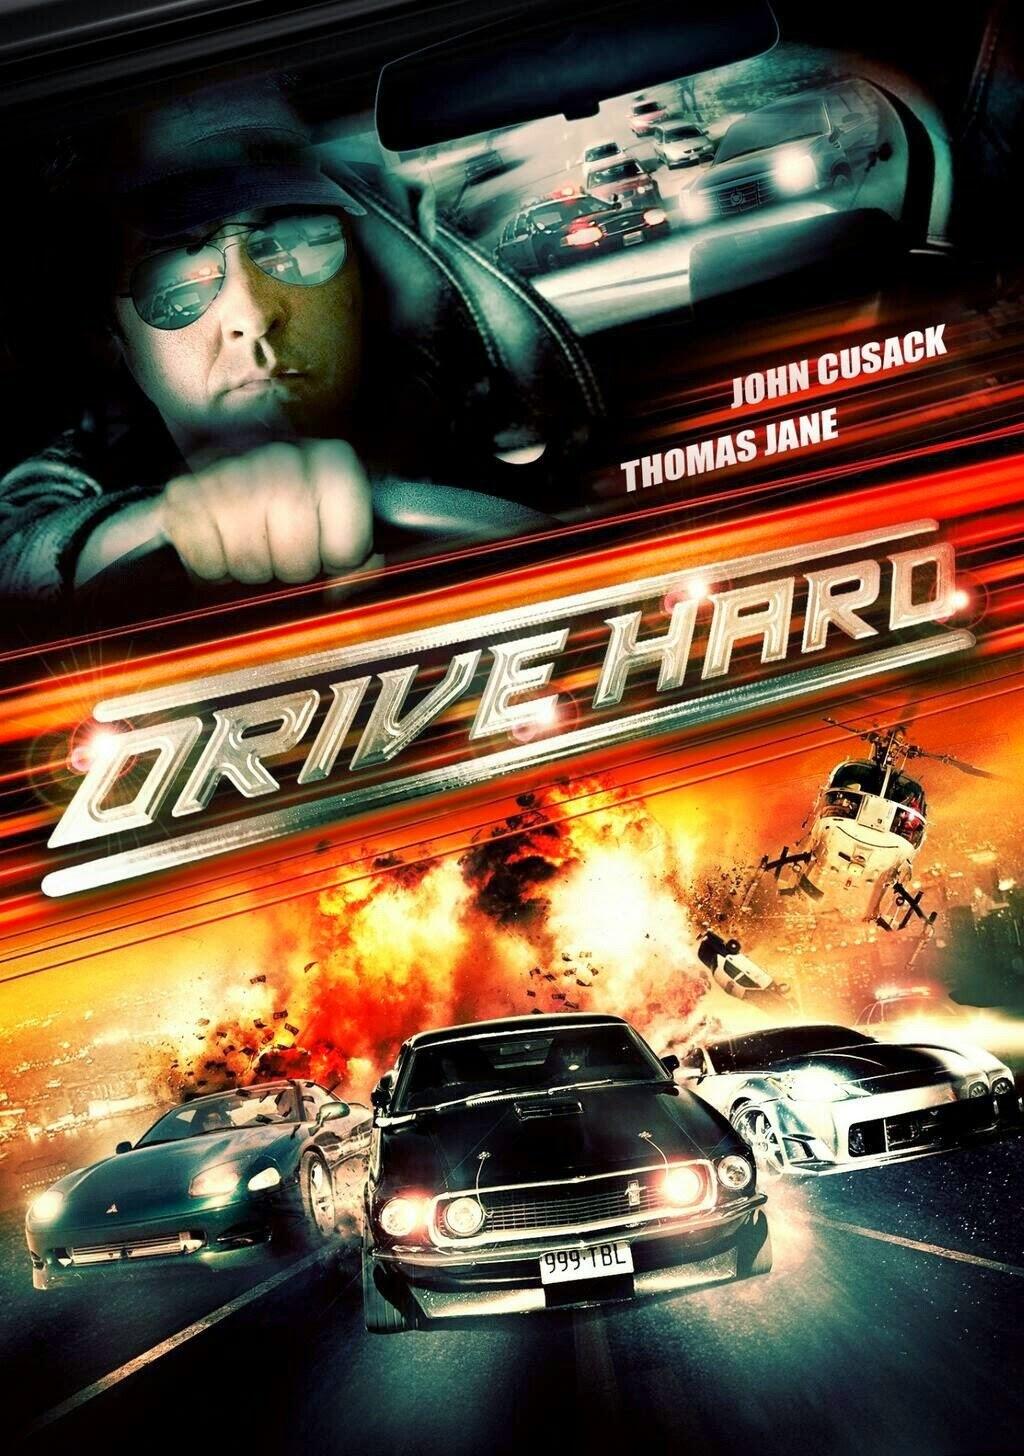 Drive Hard ปล้น-ซิ่ง-ชิ่ง-หนี [HD][พากย์ไทย]